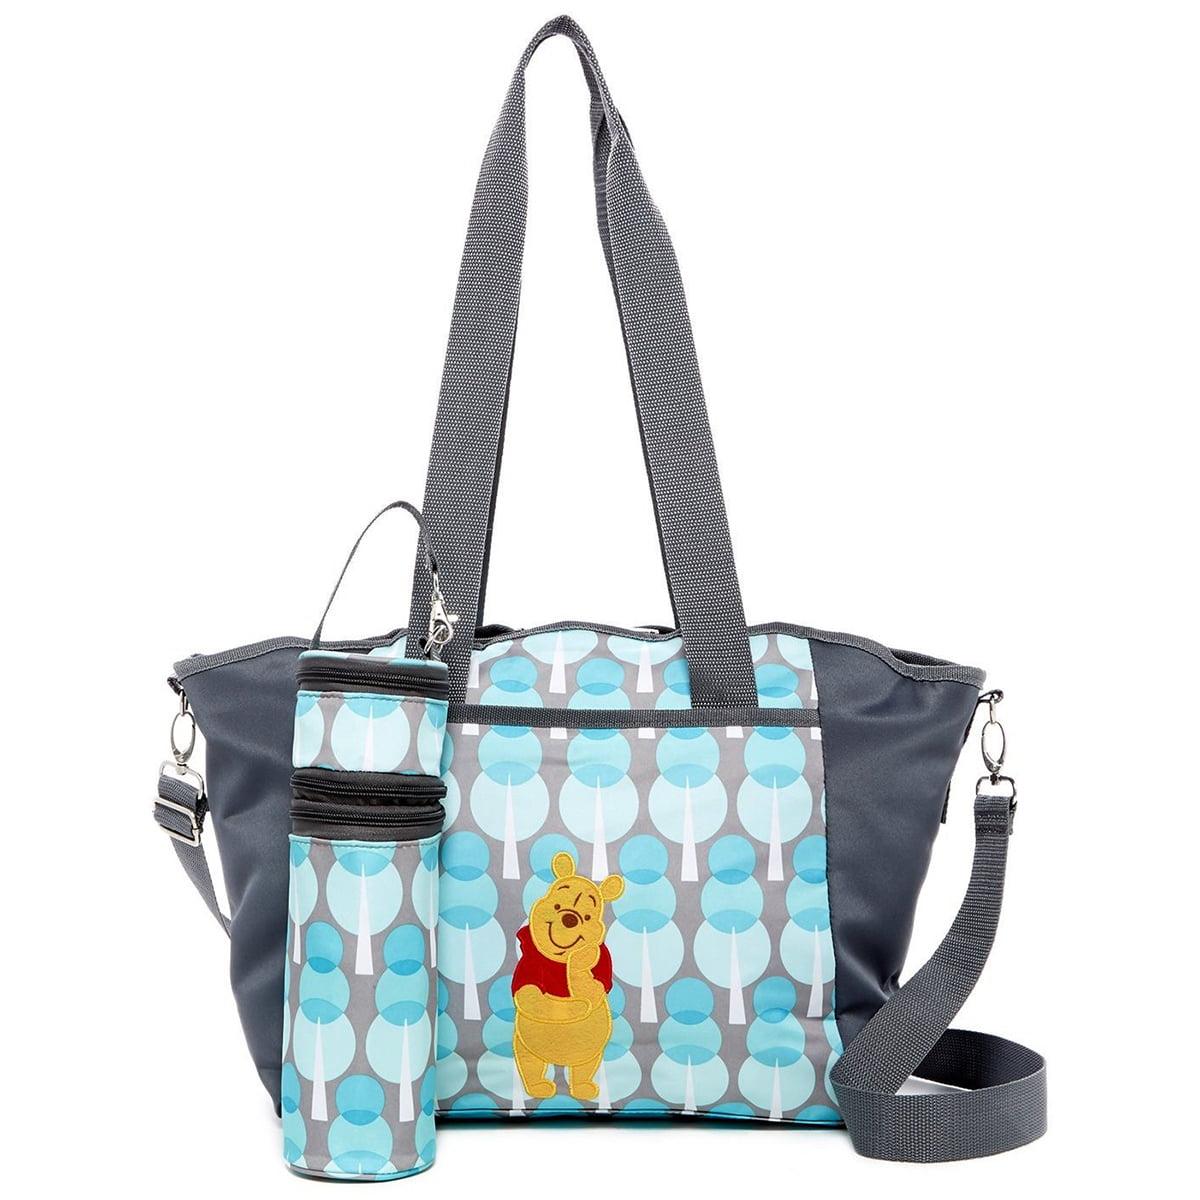 Disney Baby Diaper Tote Bag Portable Travel Organizer Changing Pad ...